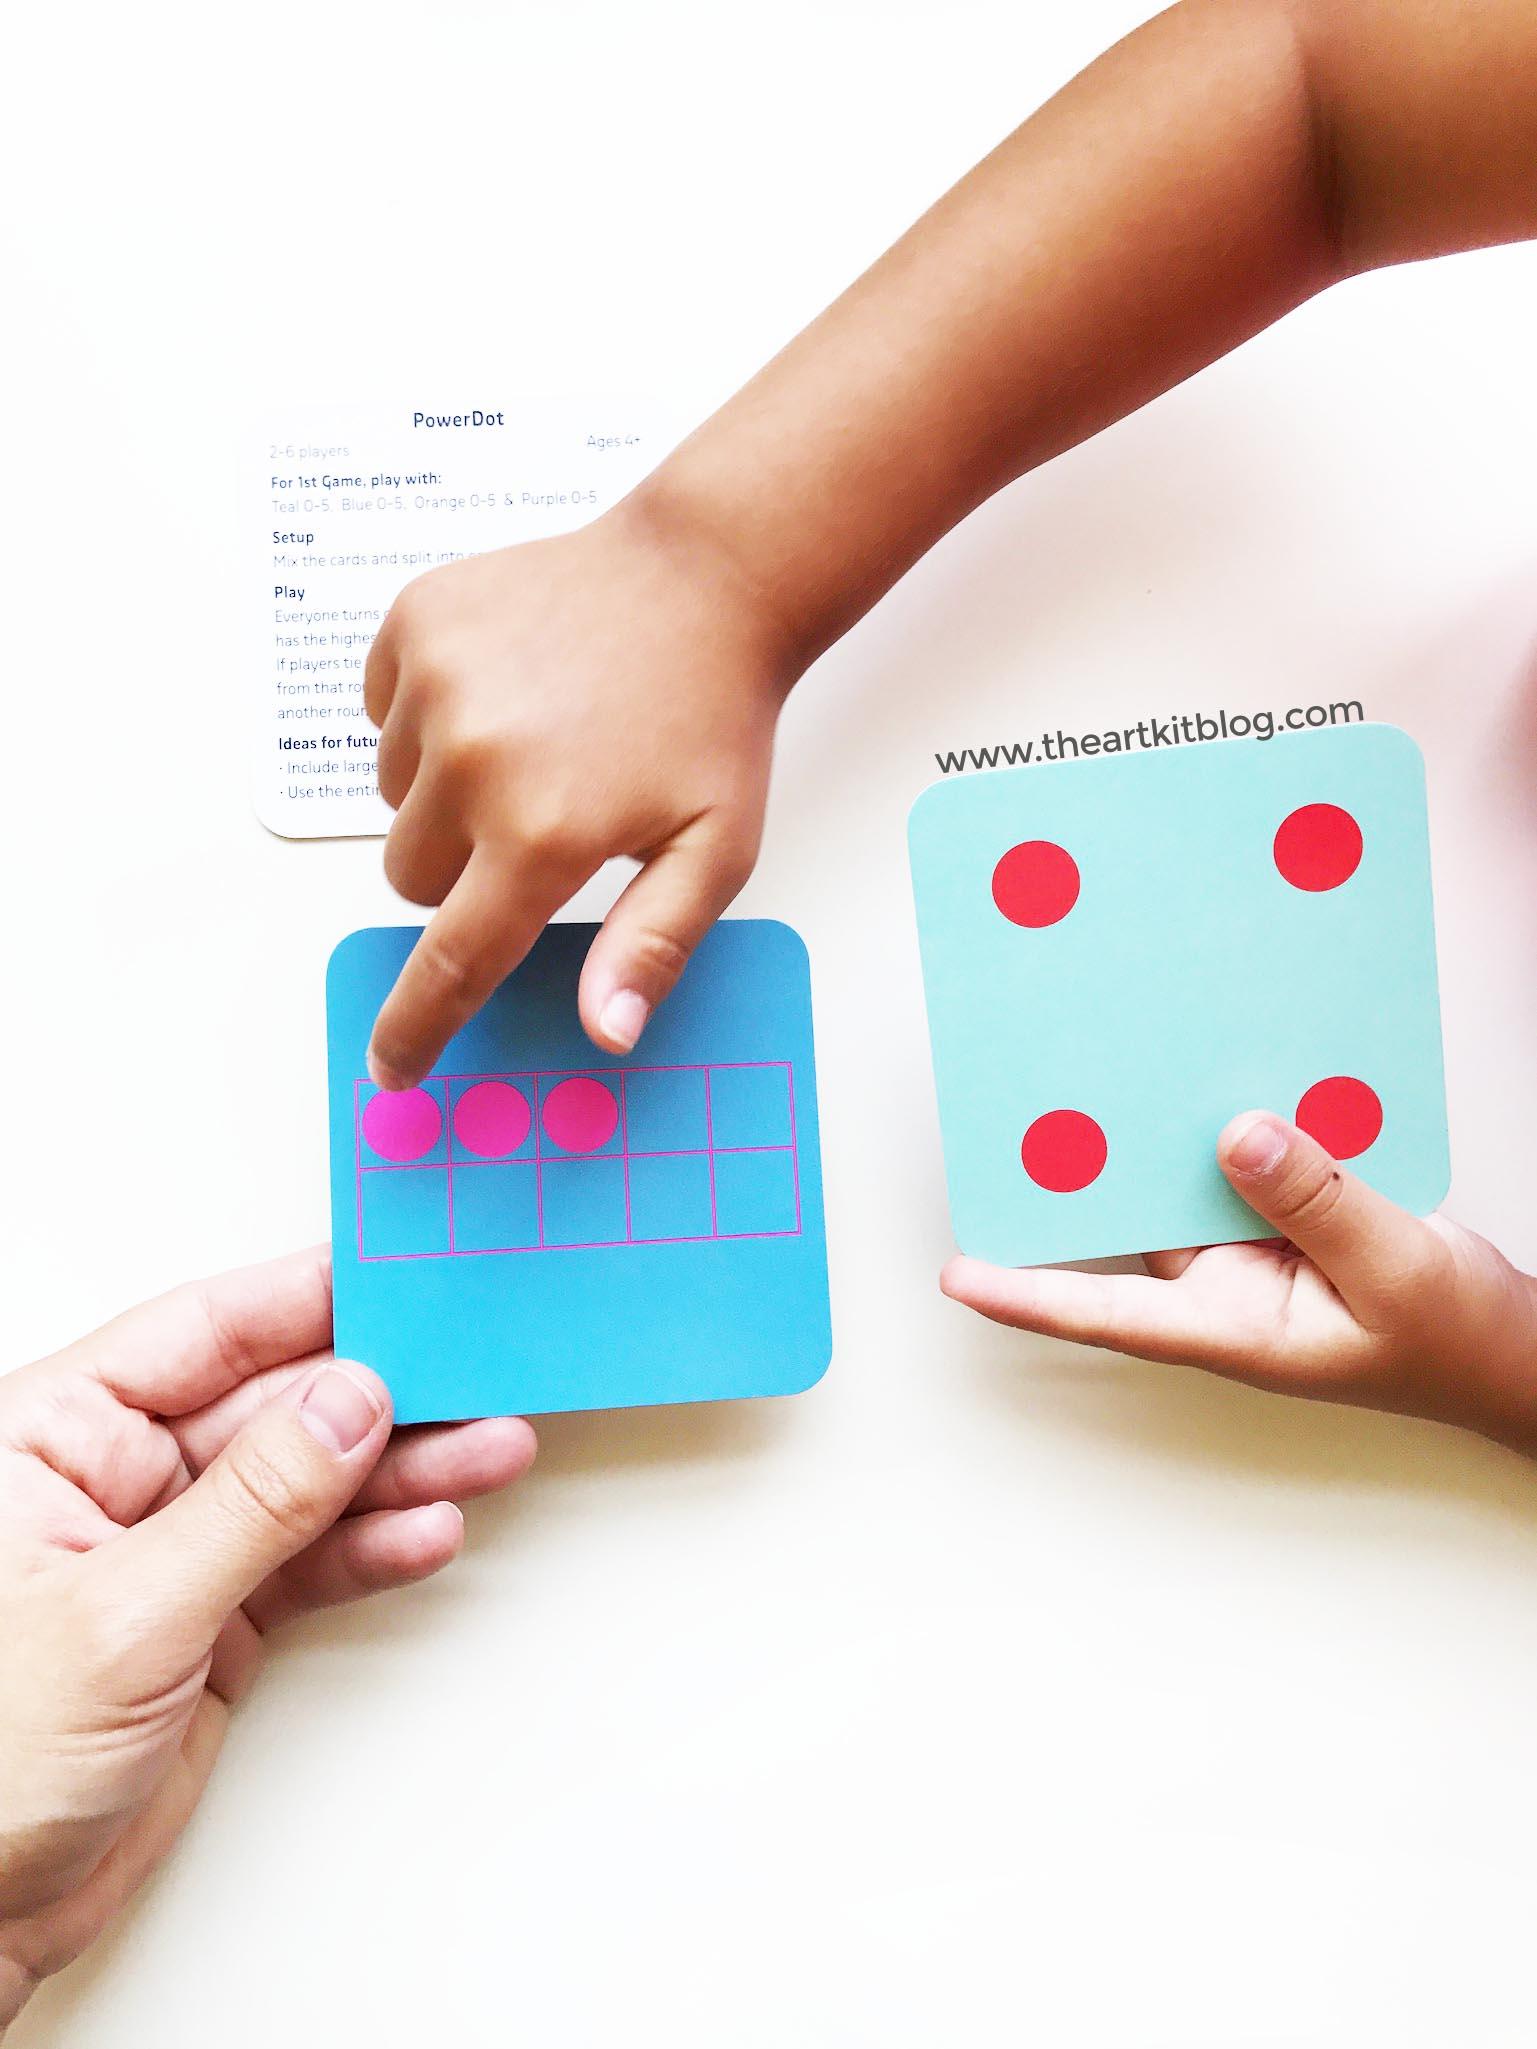 Tiny Polka Dot Game Timberdoodle Game For Kids Math